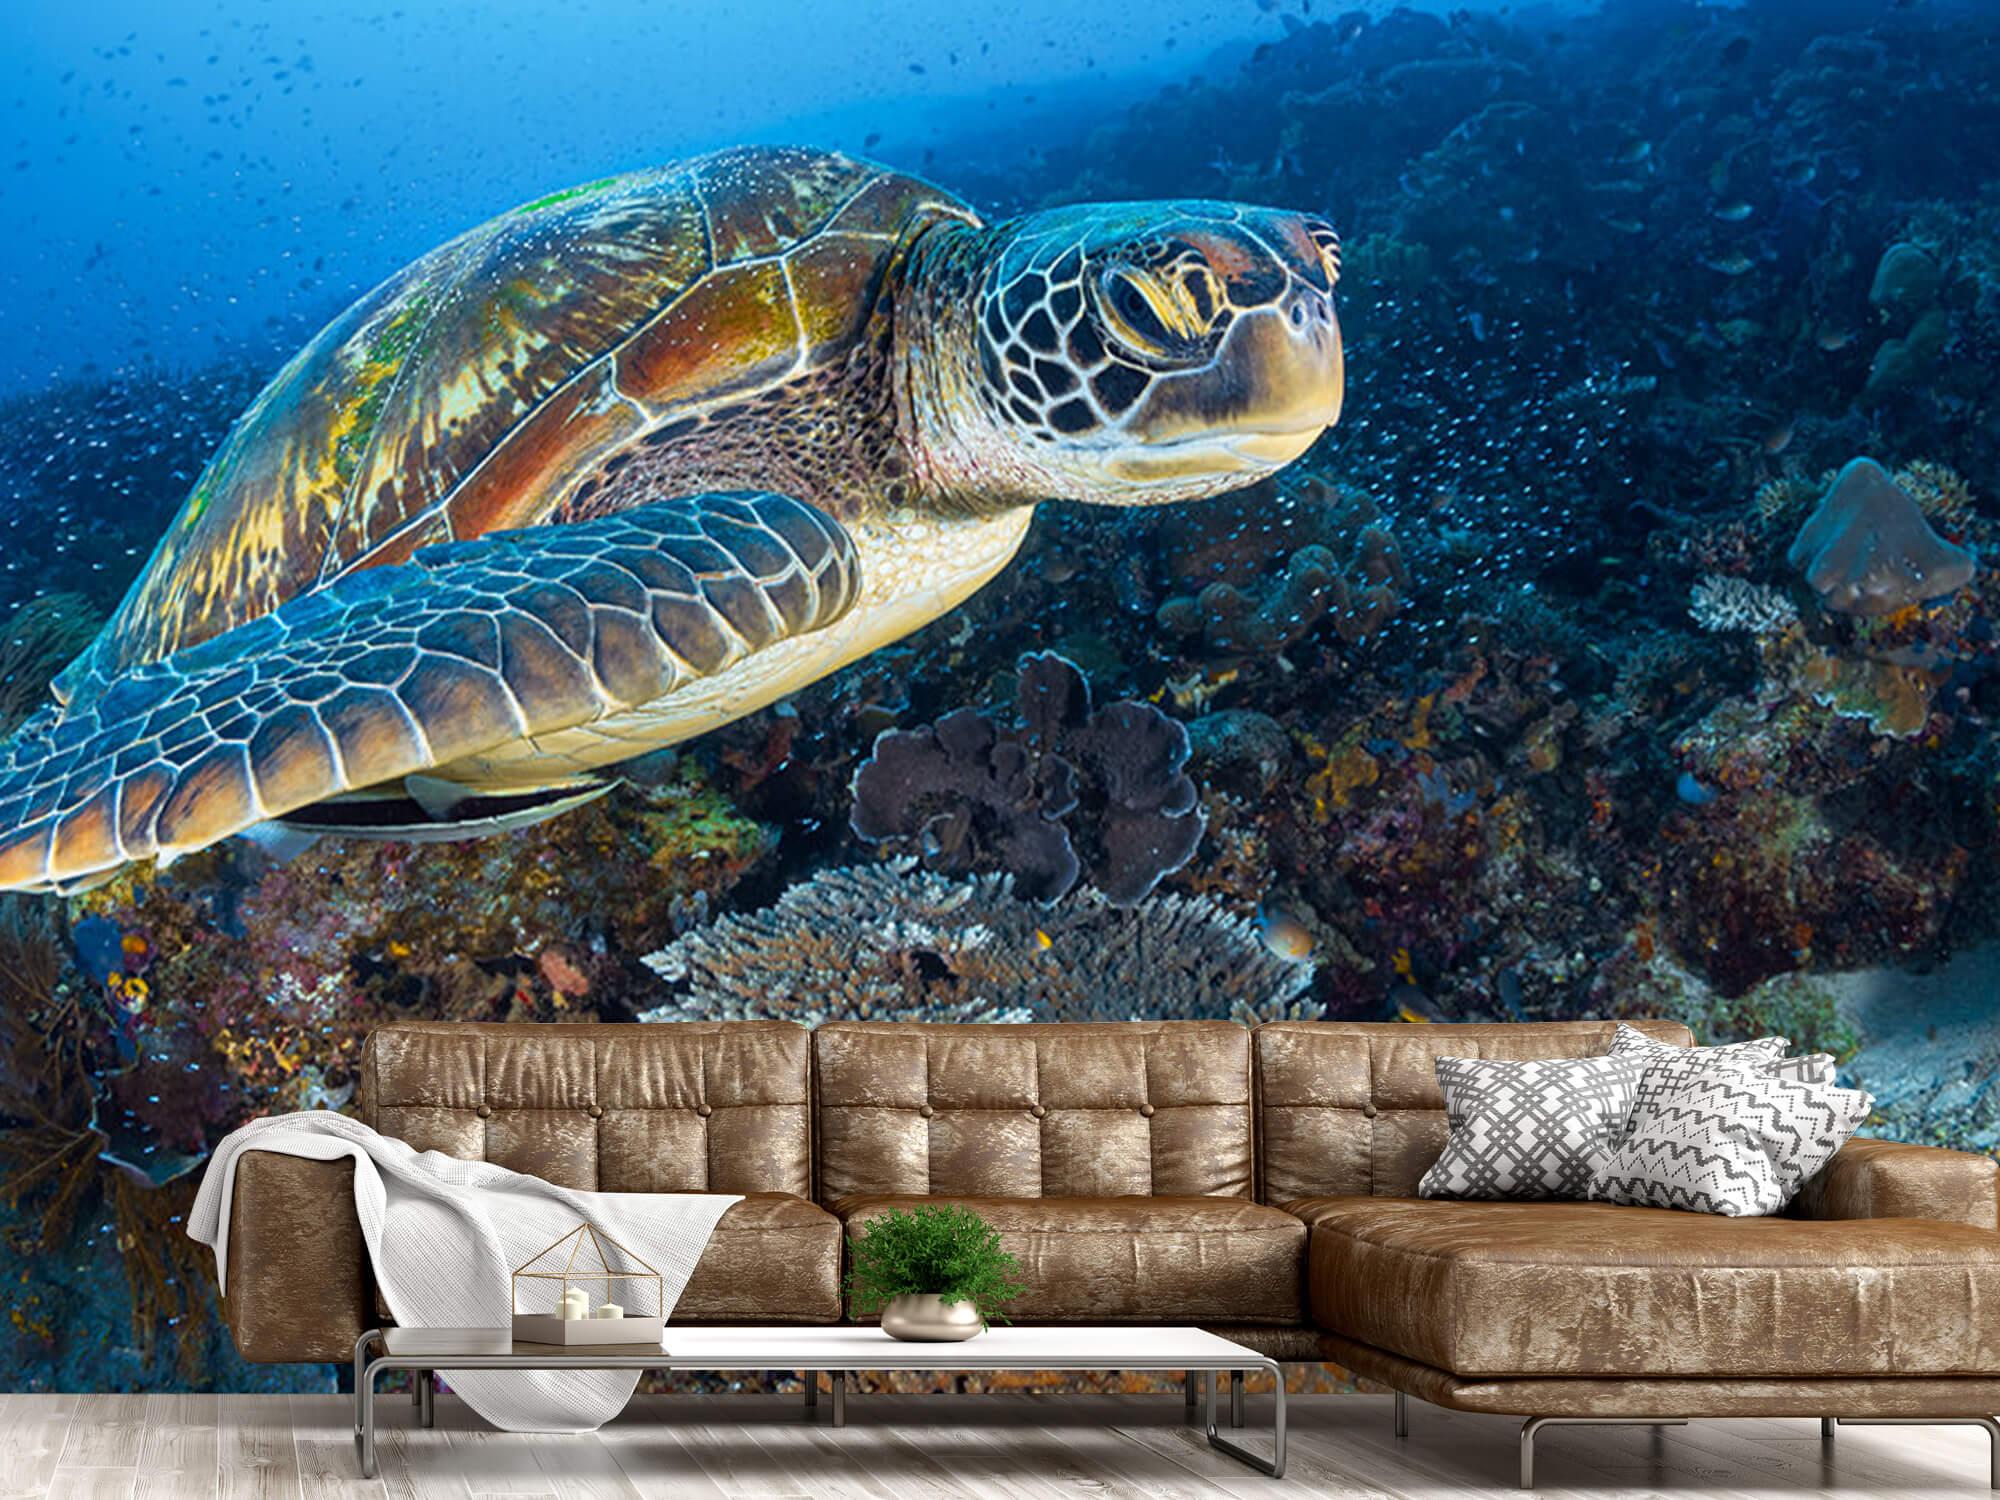 Green sea turtle from Raja Ampat 10